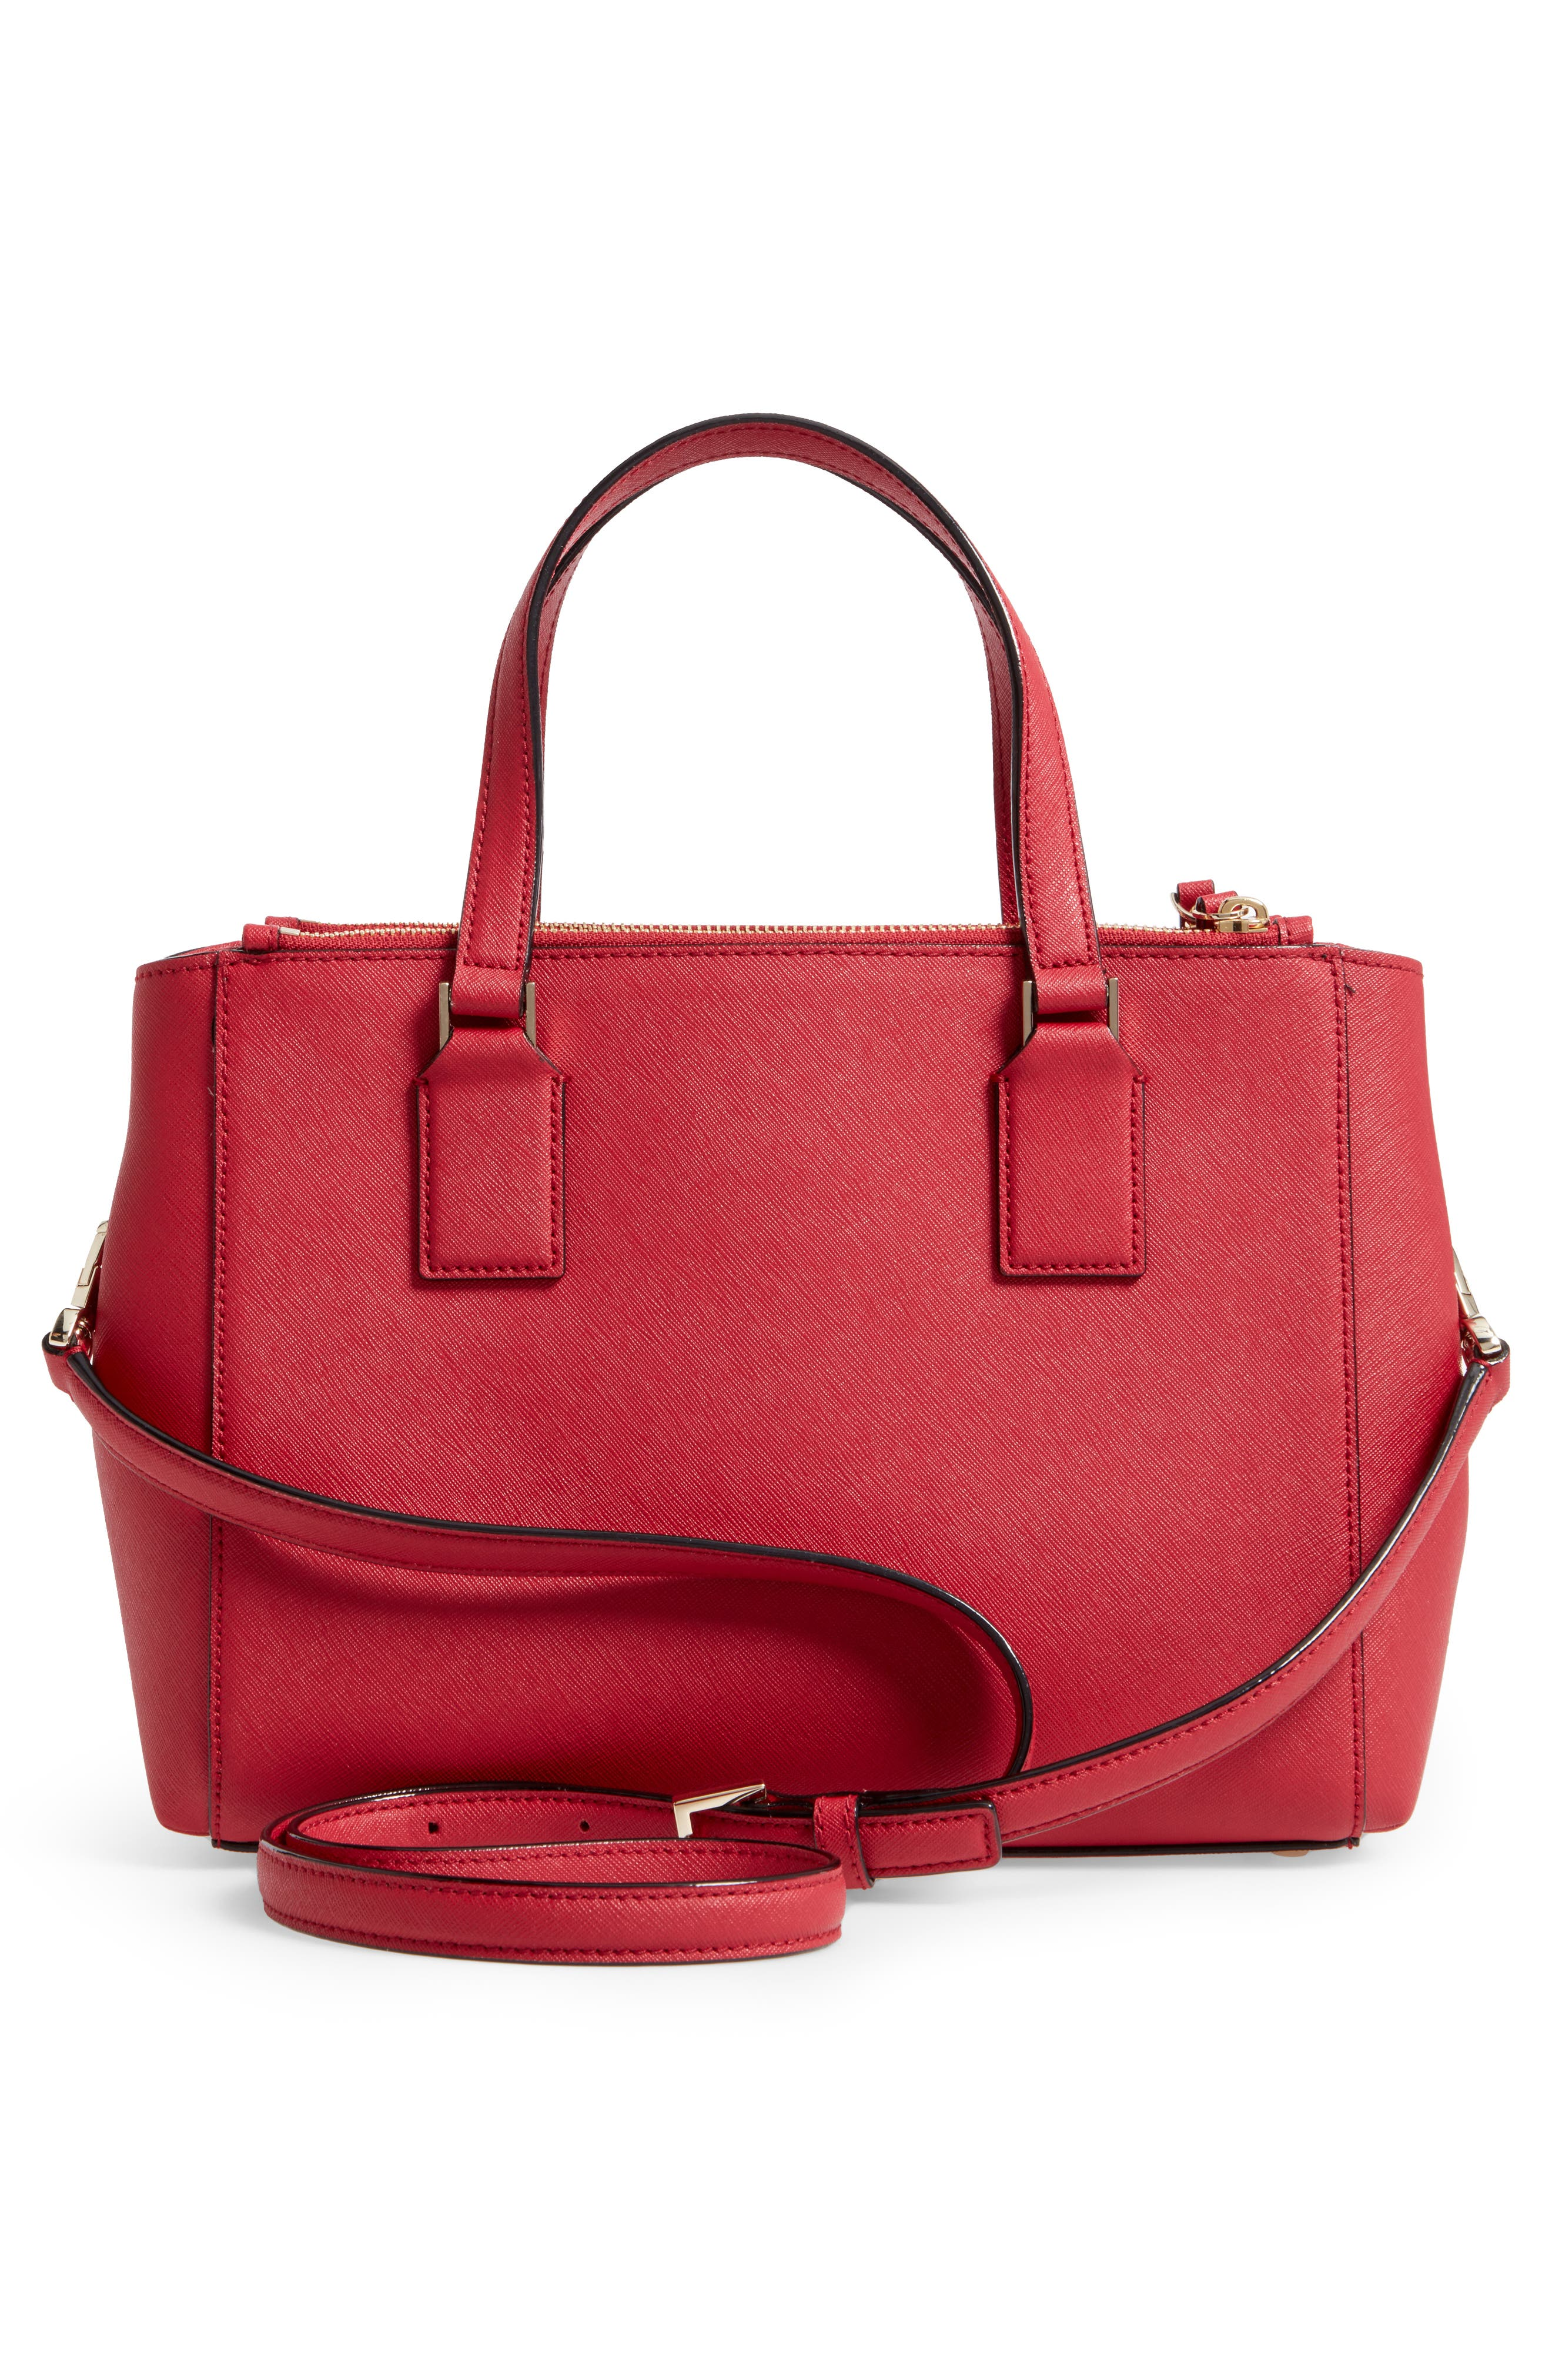 cameron street - teegan calfskin leather satchel,                             Alternate thumbnail 3, color,                             638